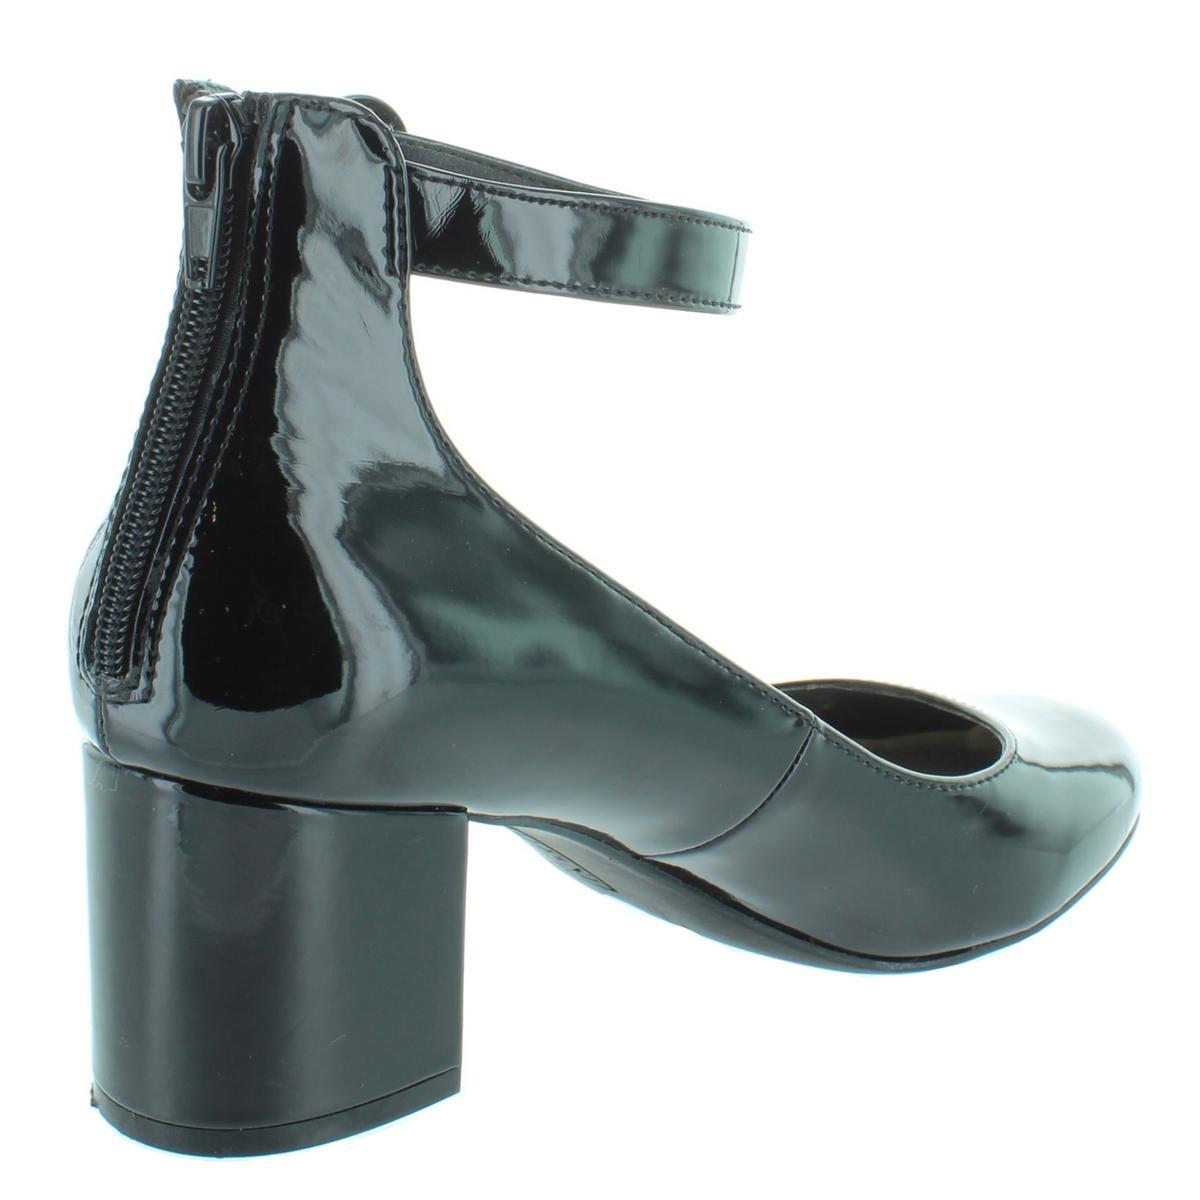 Alfani-Femme-ashiaa-Cheville-Sangle-Escarpins-Chaussures-BHFO-5590 miniature 4